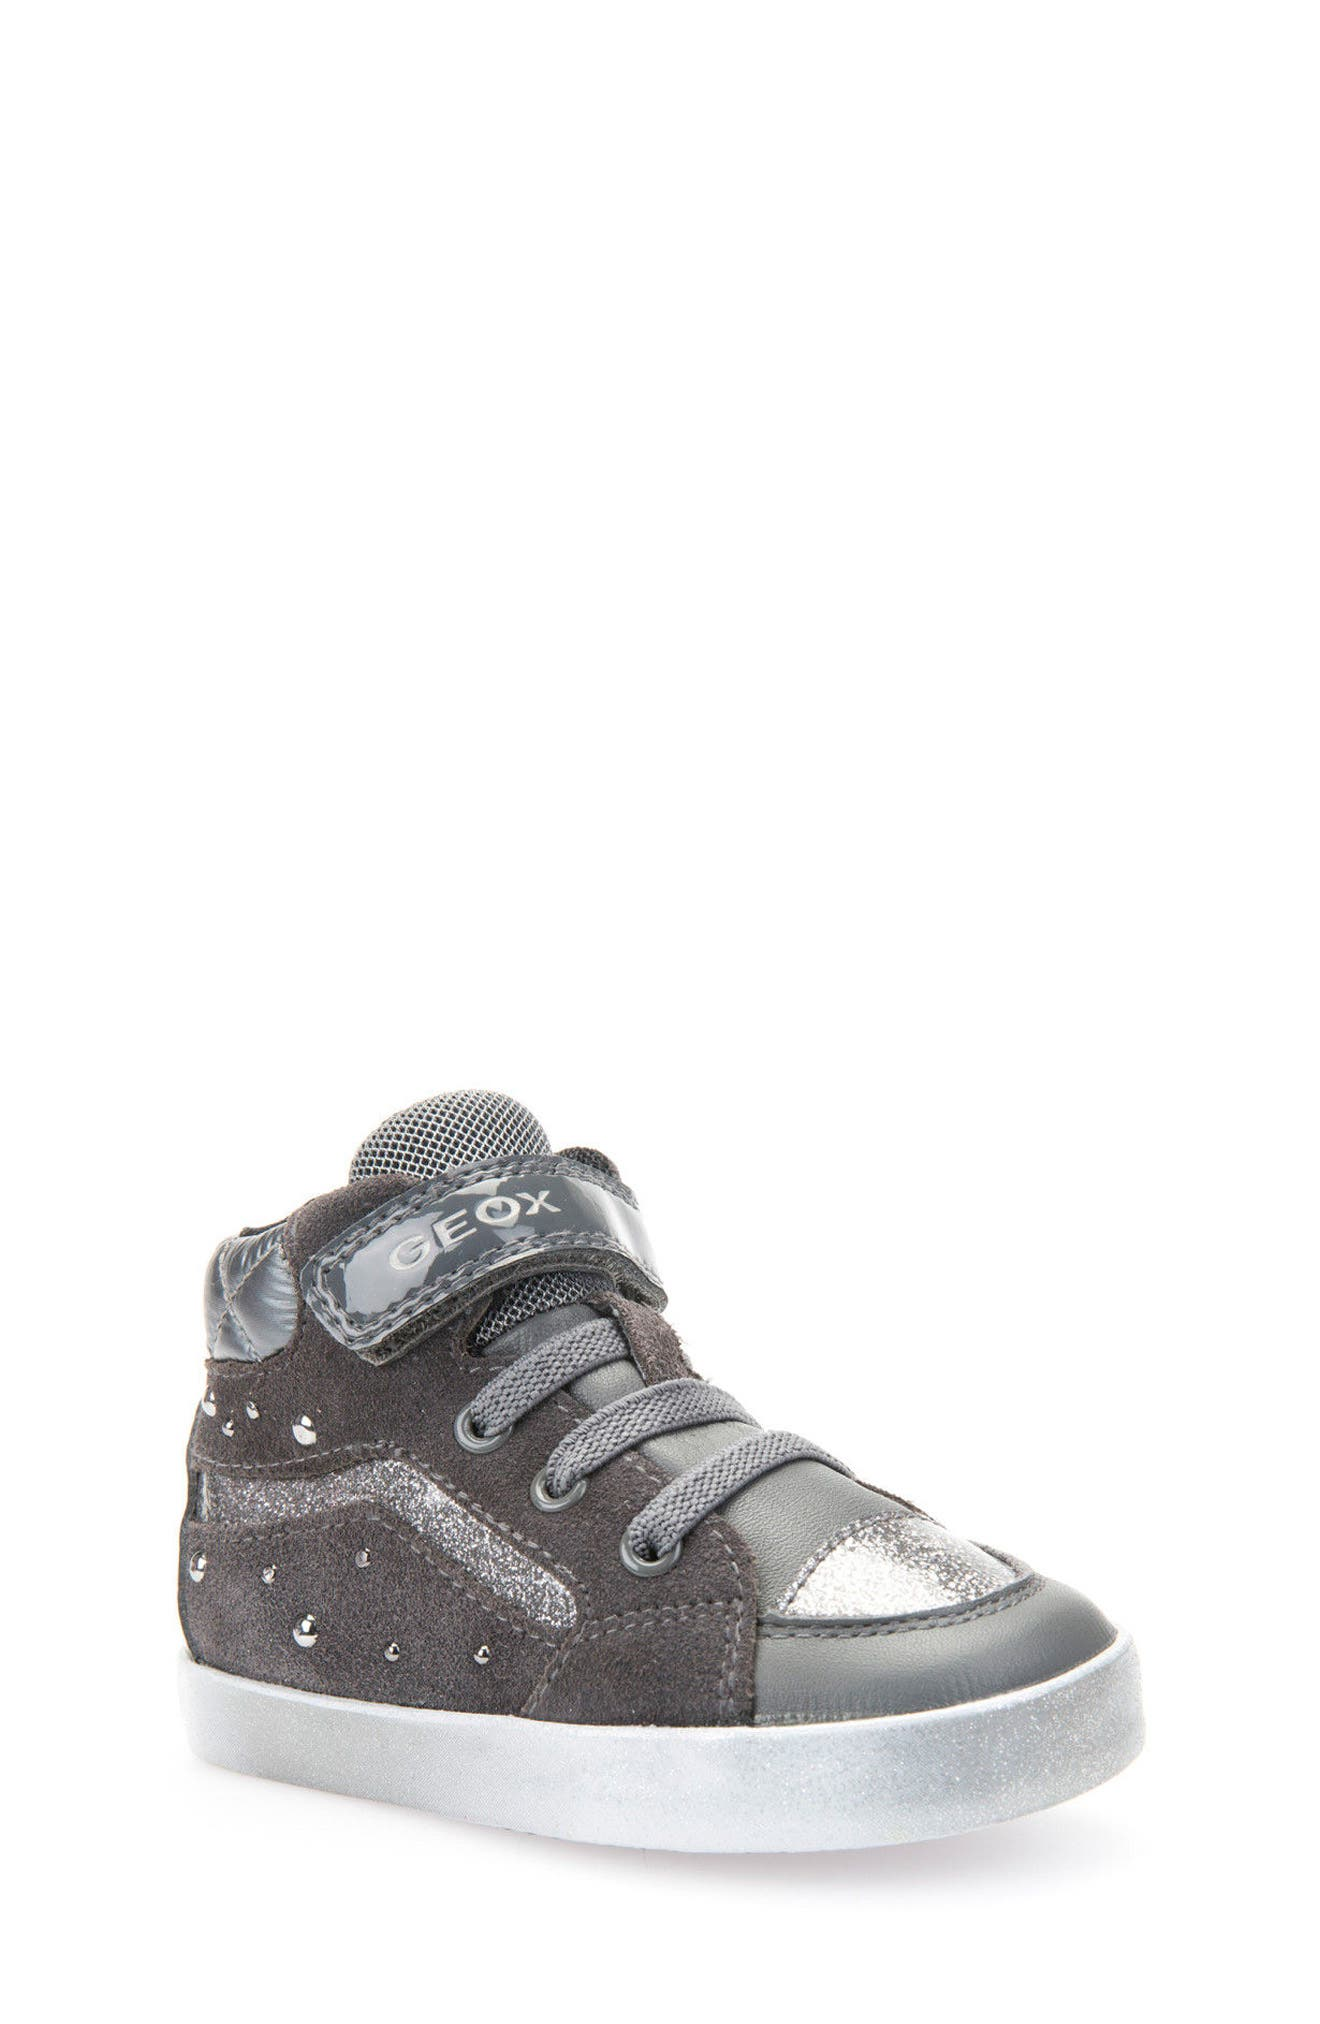 Kiwi Studded High Top Sneaker,                             Main thumbnail 1, color,                             020